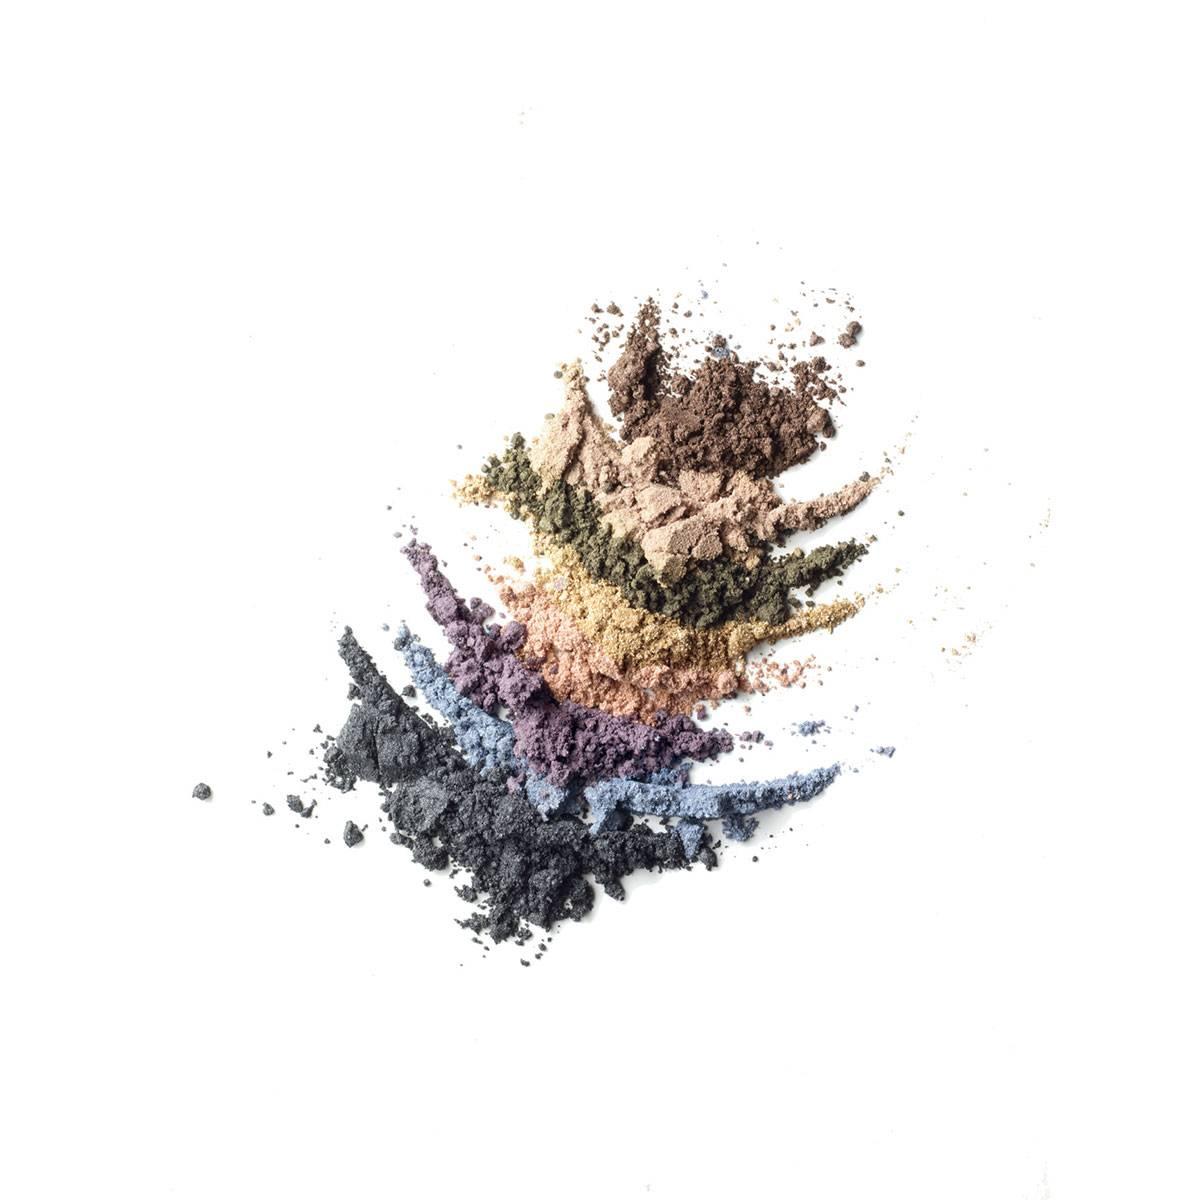 La Roche Posay Herkkä Toleriane Make up EYE_SHADOW Texture